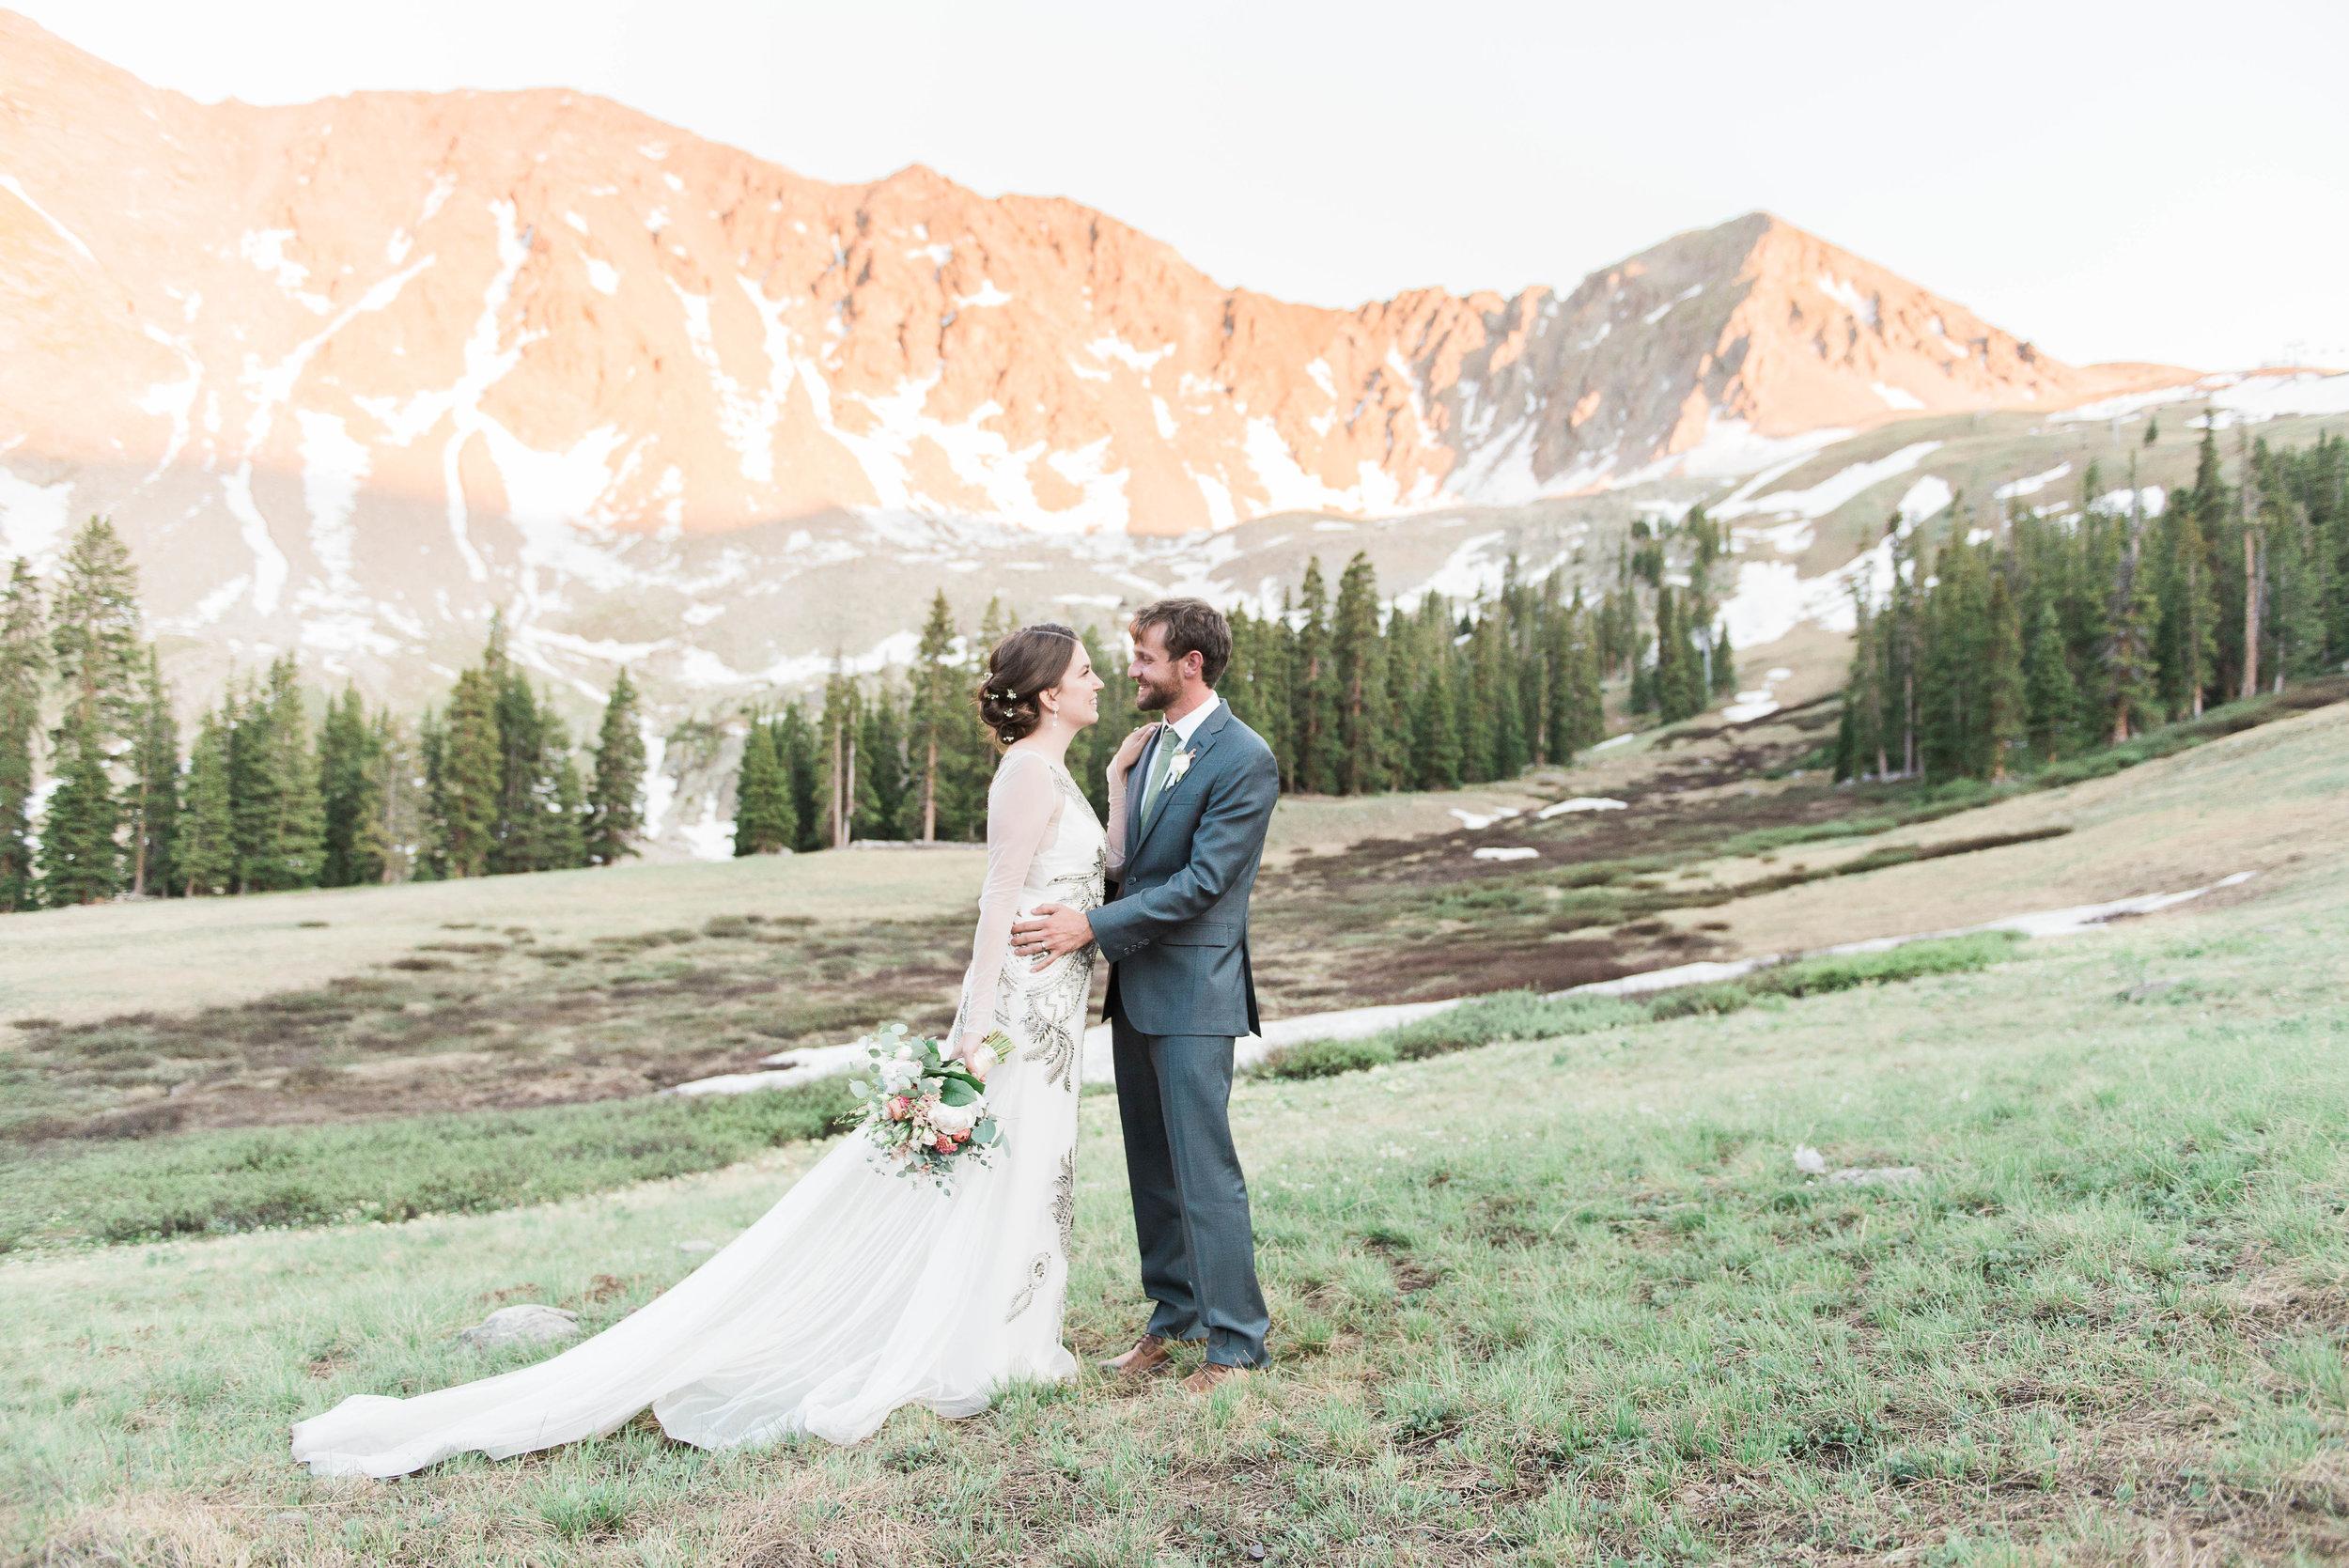 AshleighMillerWeddings-MichelleAllen-ArapahoeBasin-Colorado-4630.jpg